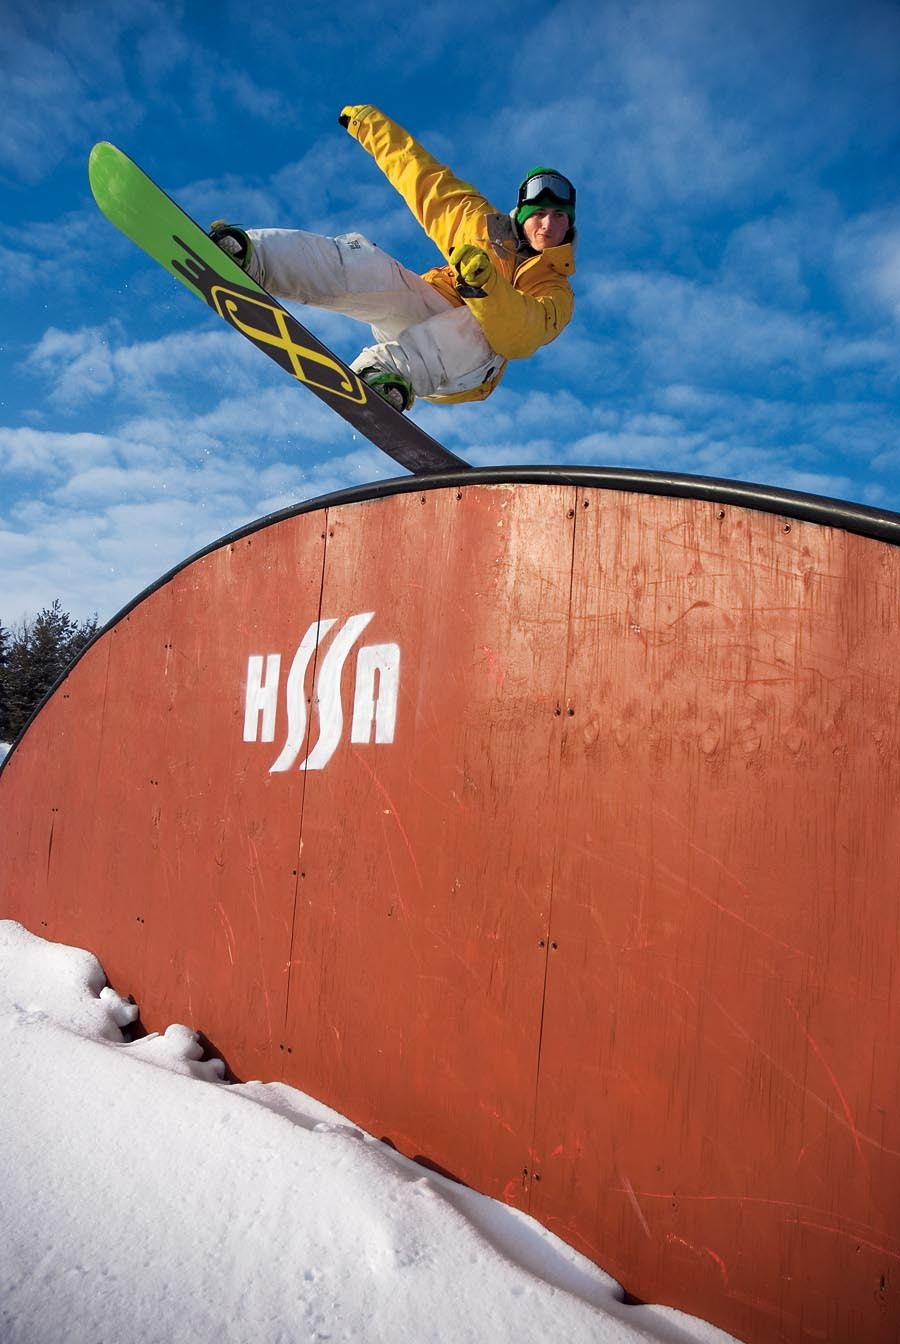 Best Spring Skiing Resorts